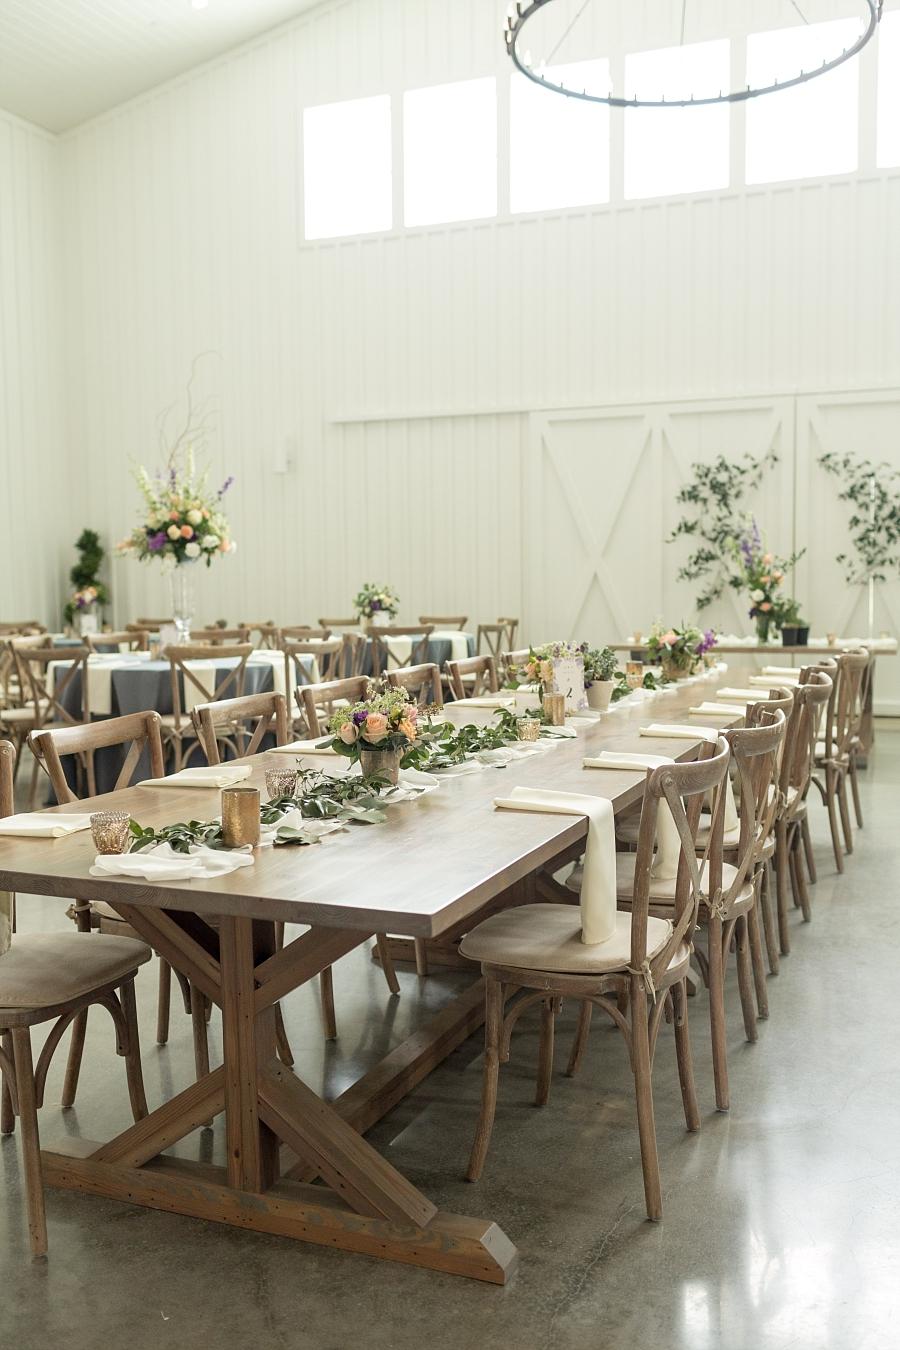 Stacy-Anderson-Photography-The-Farmhouse-Houston-Wedding-Photographer_0025.jpg